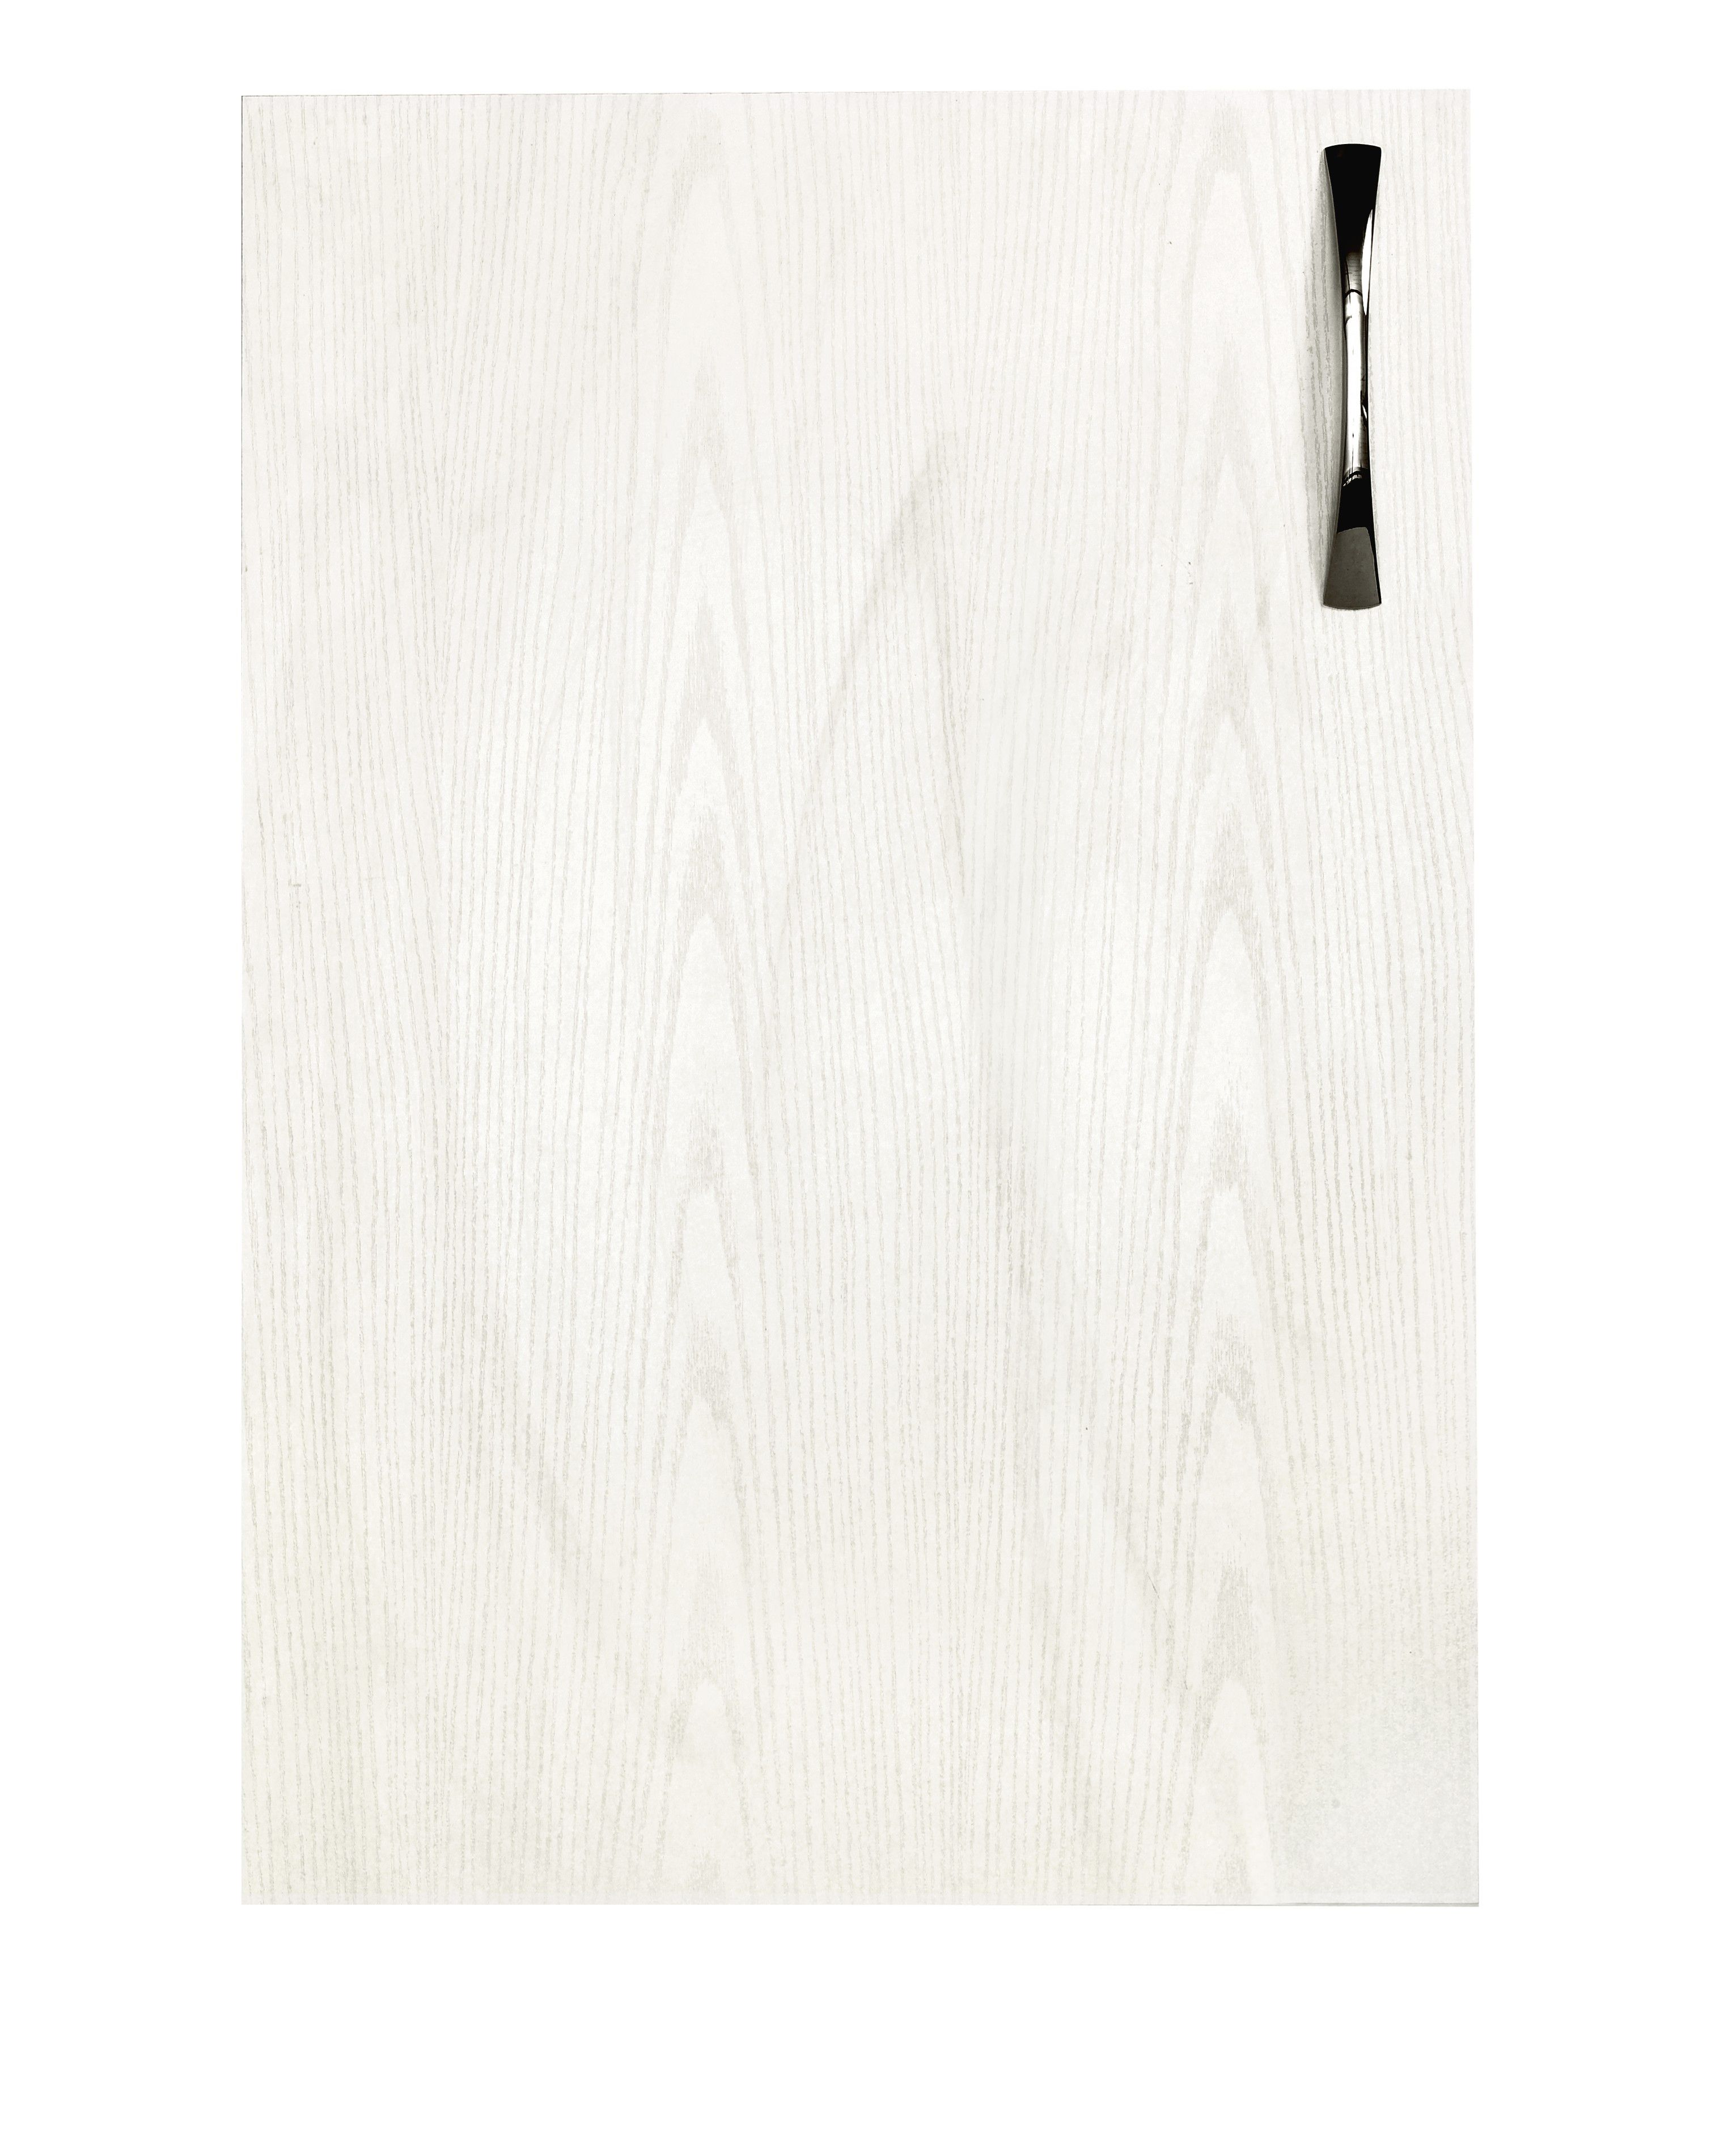 Trieste White Willow Rixonway Kitchens Door handles